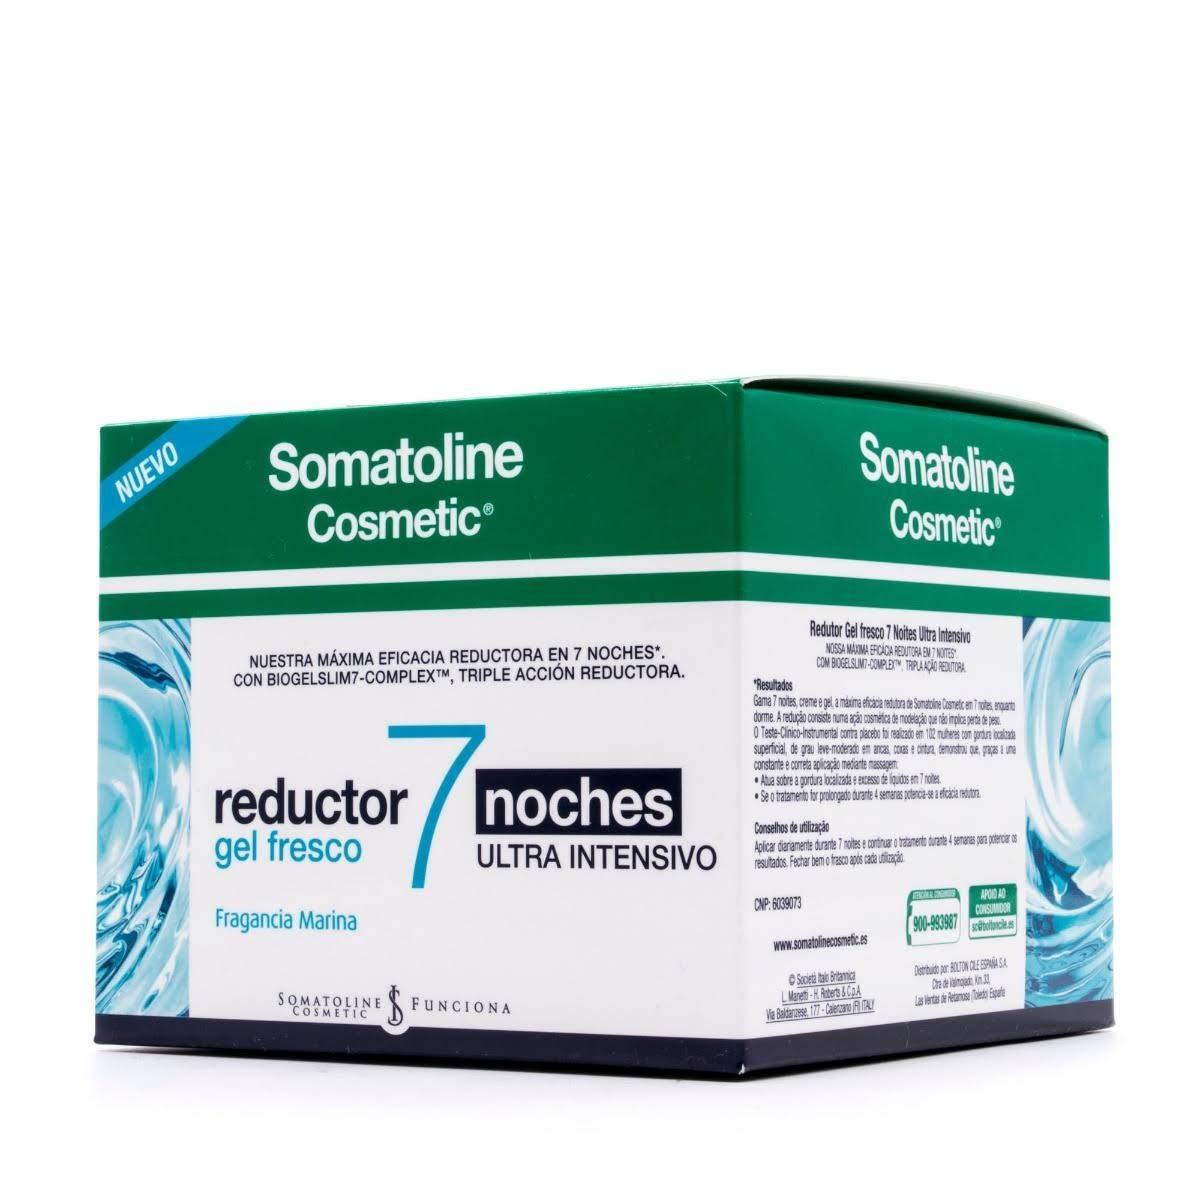 Somatoline Cosmetic Reductor 7 Noches Ultra Intensivo Gel Fresco, 250 ml